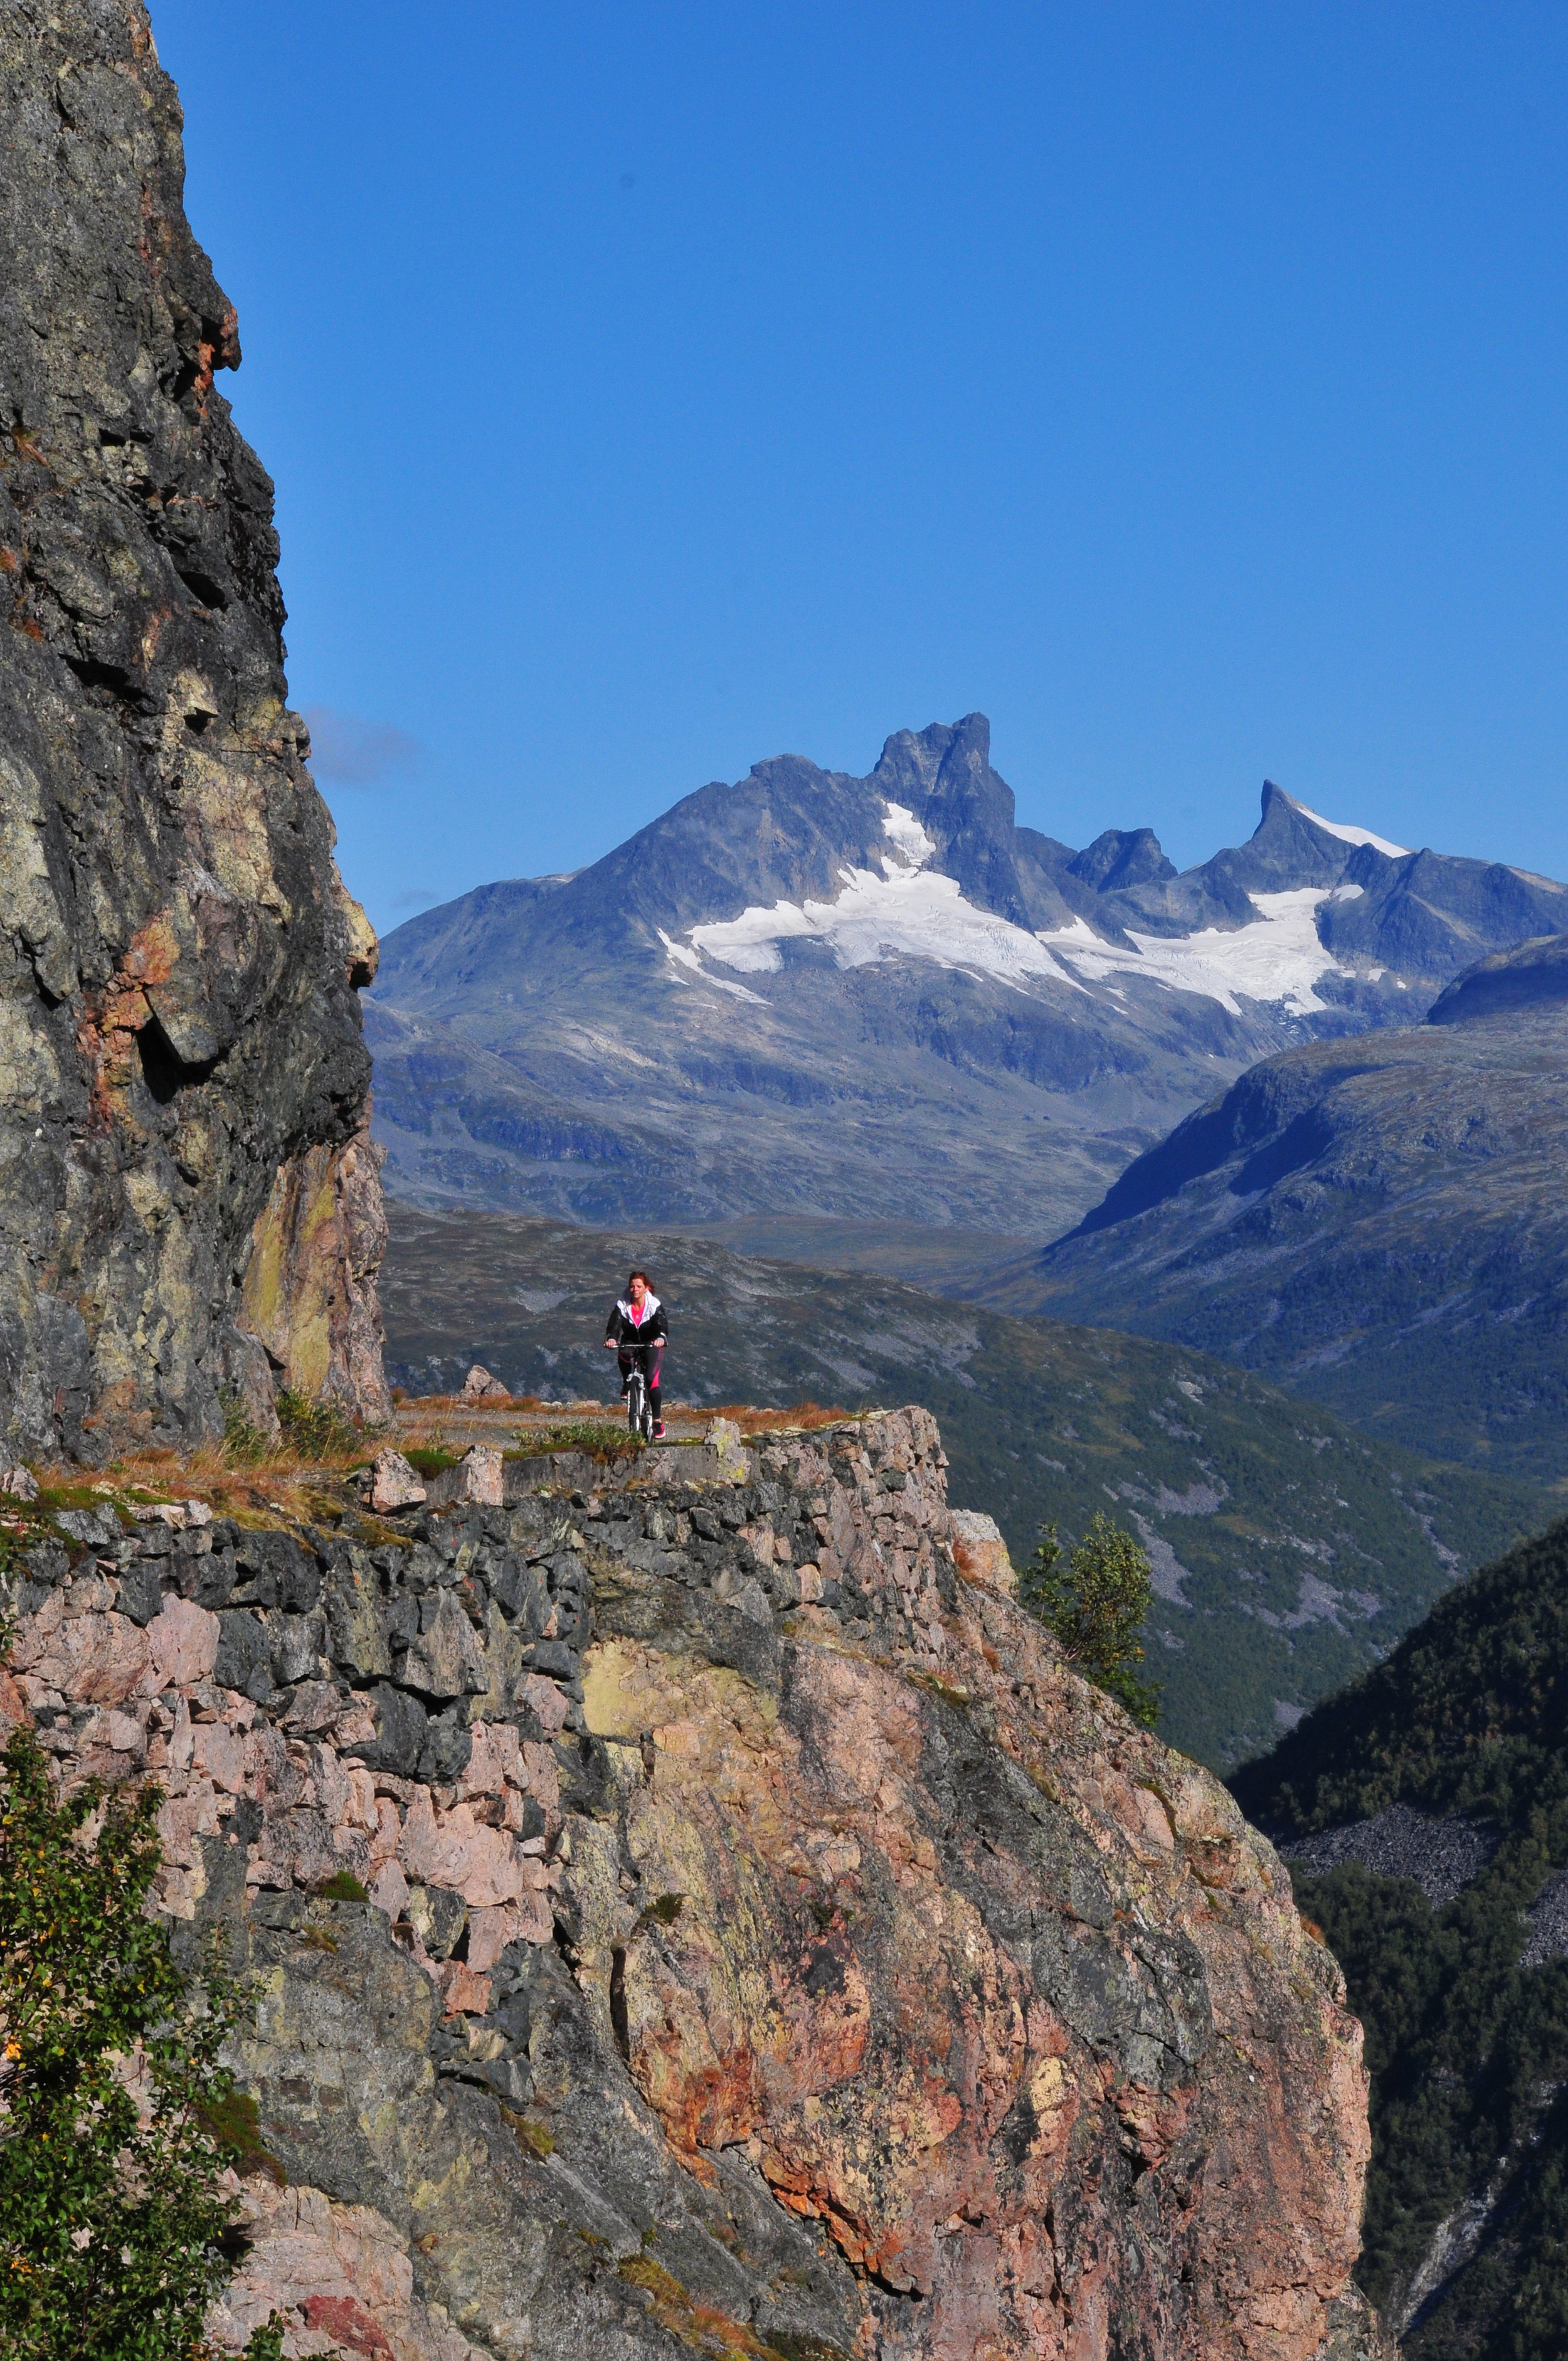 sykkeltur-Sletterust-1000-meteren (Heirsnosi)-1.jpg